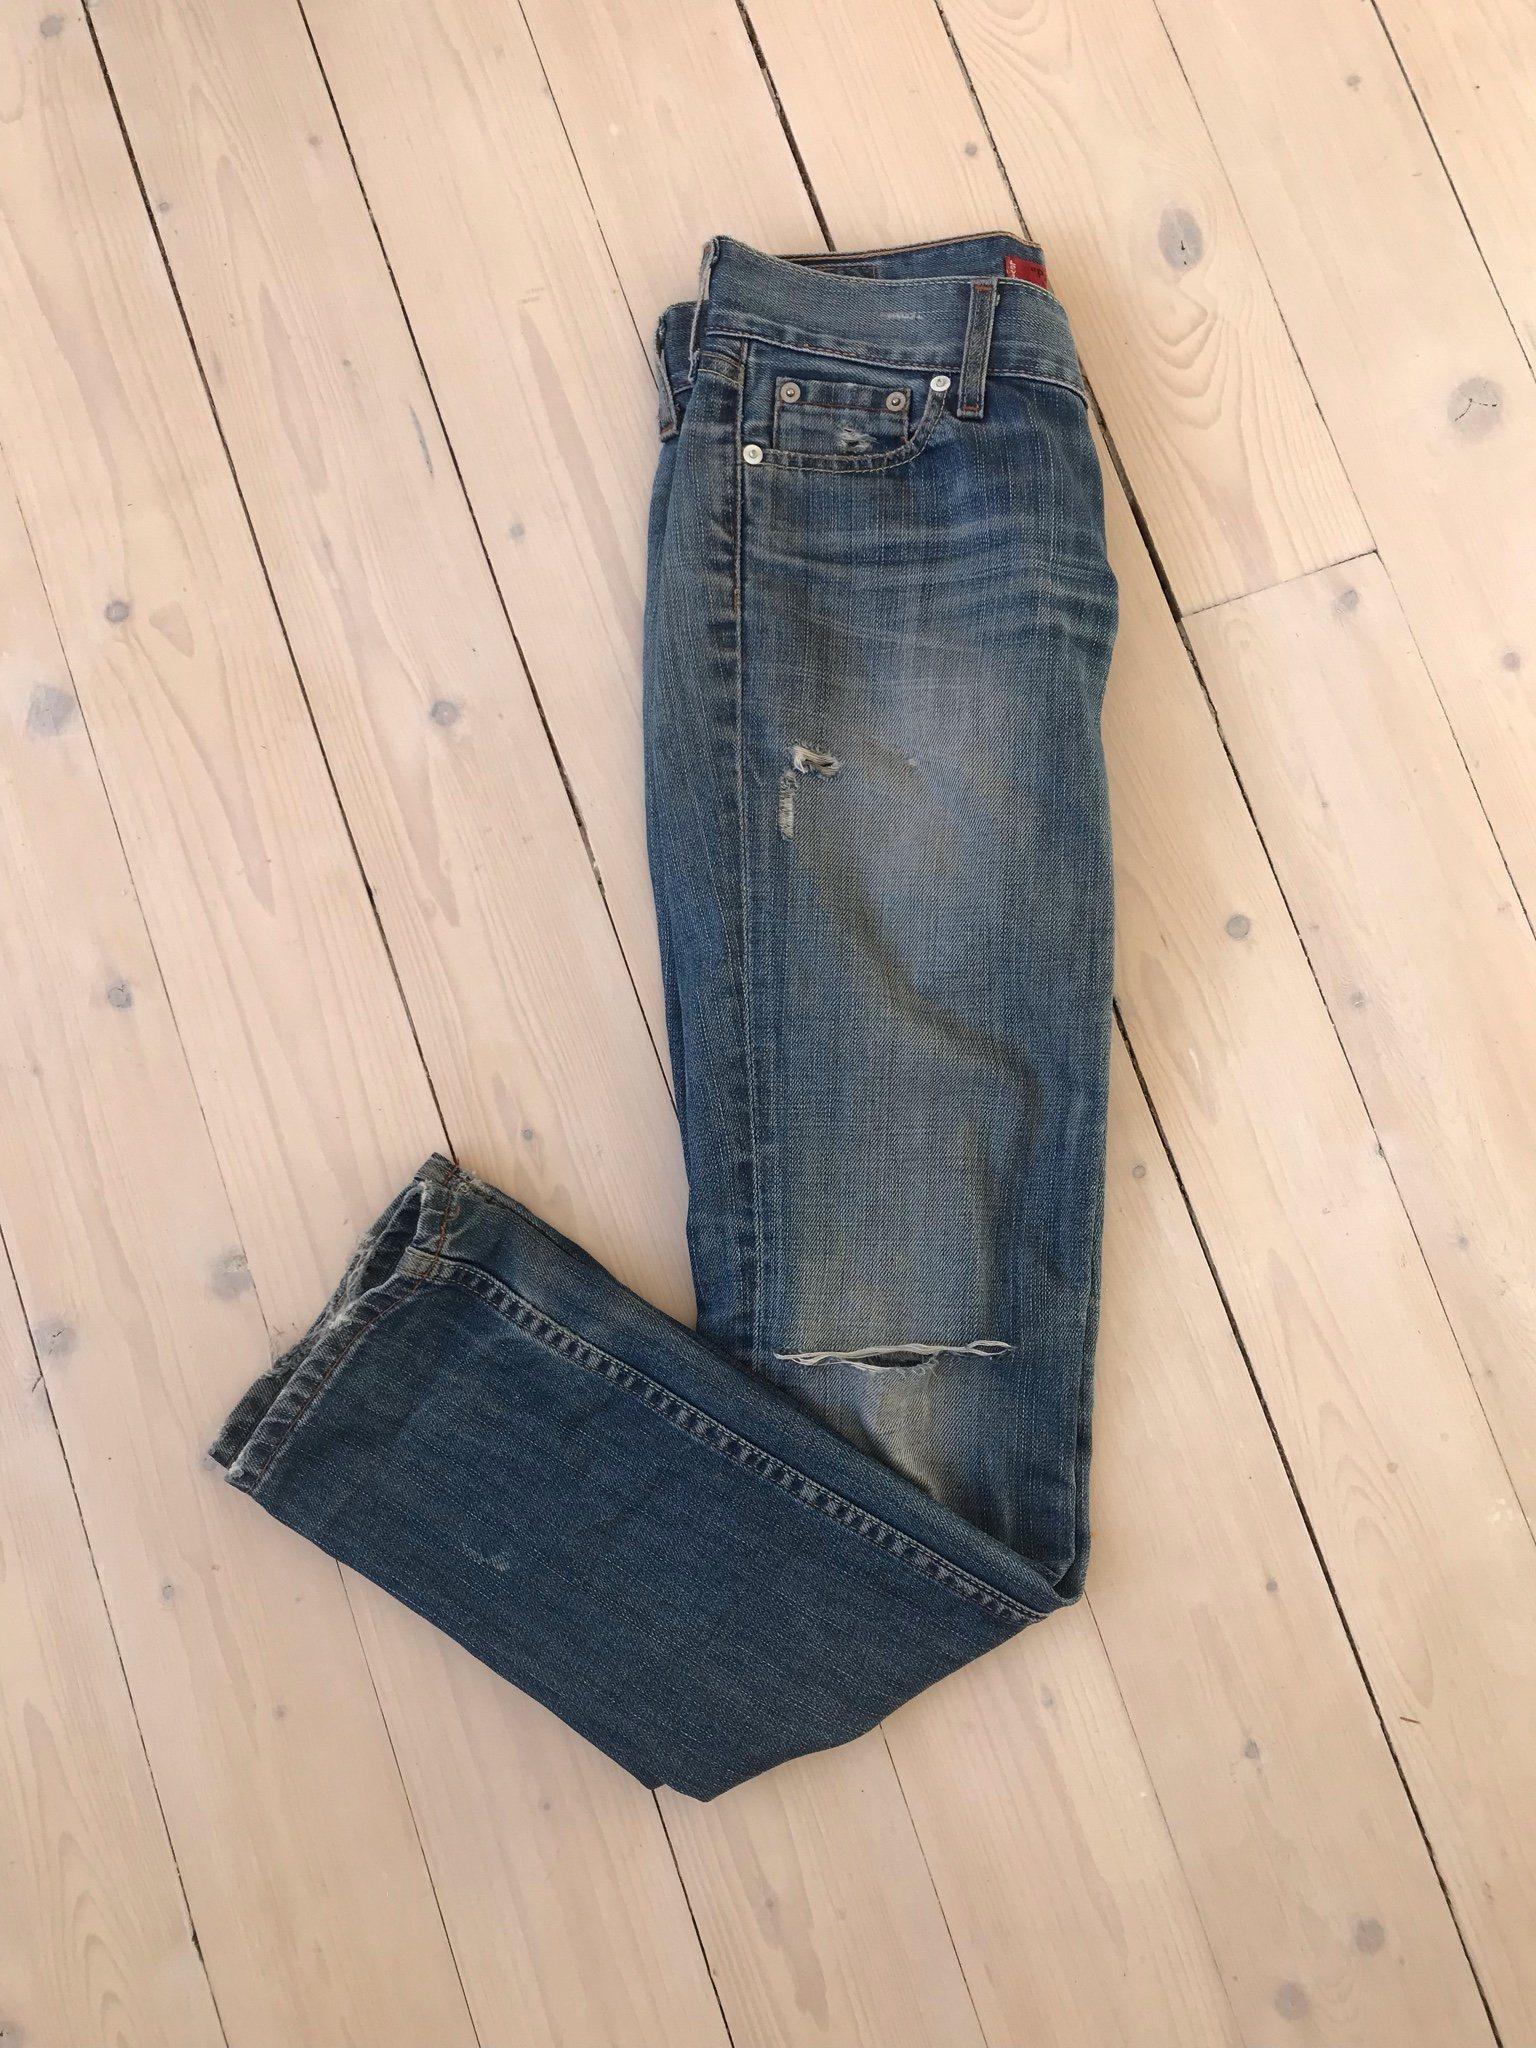 e2df3dea966 Jeans Patty Anne, Levis, stl 27/32 (344615224) ᐈ Köp på Tradera